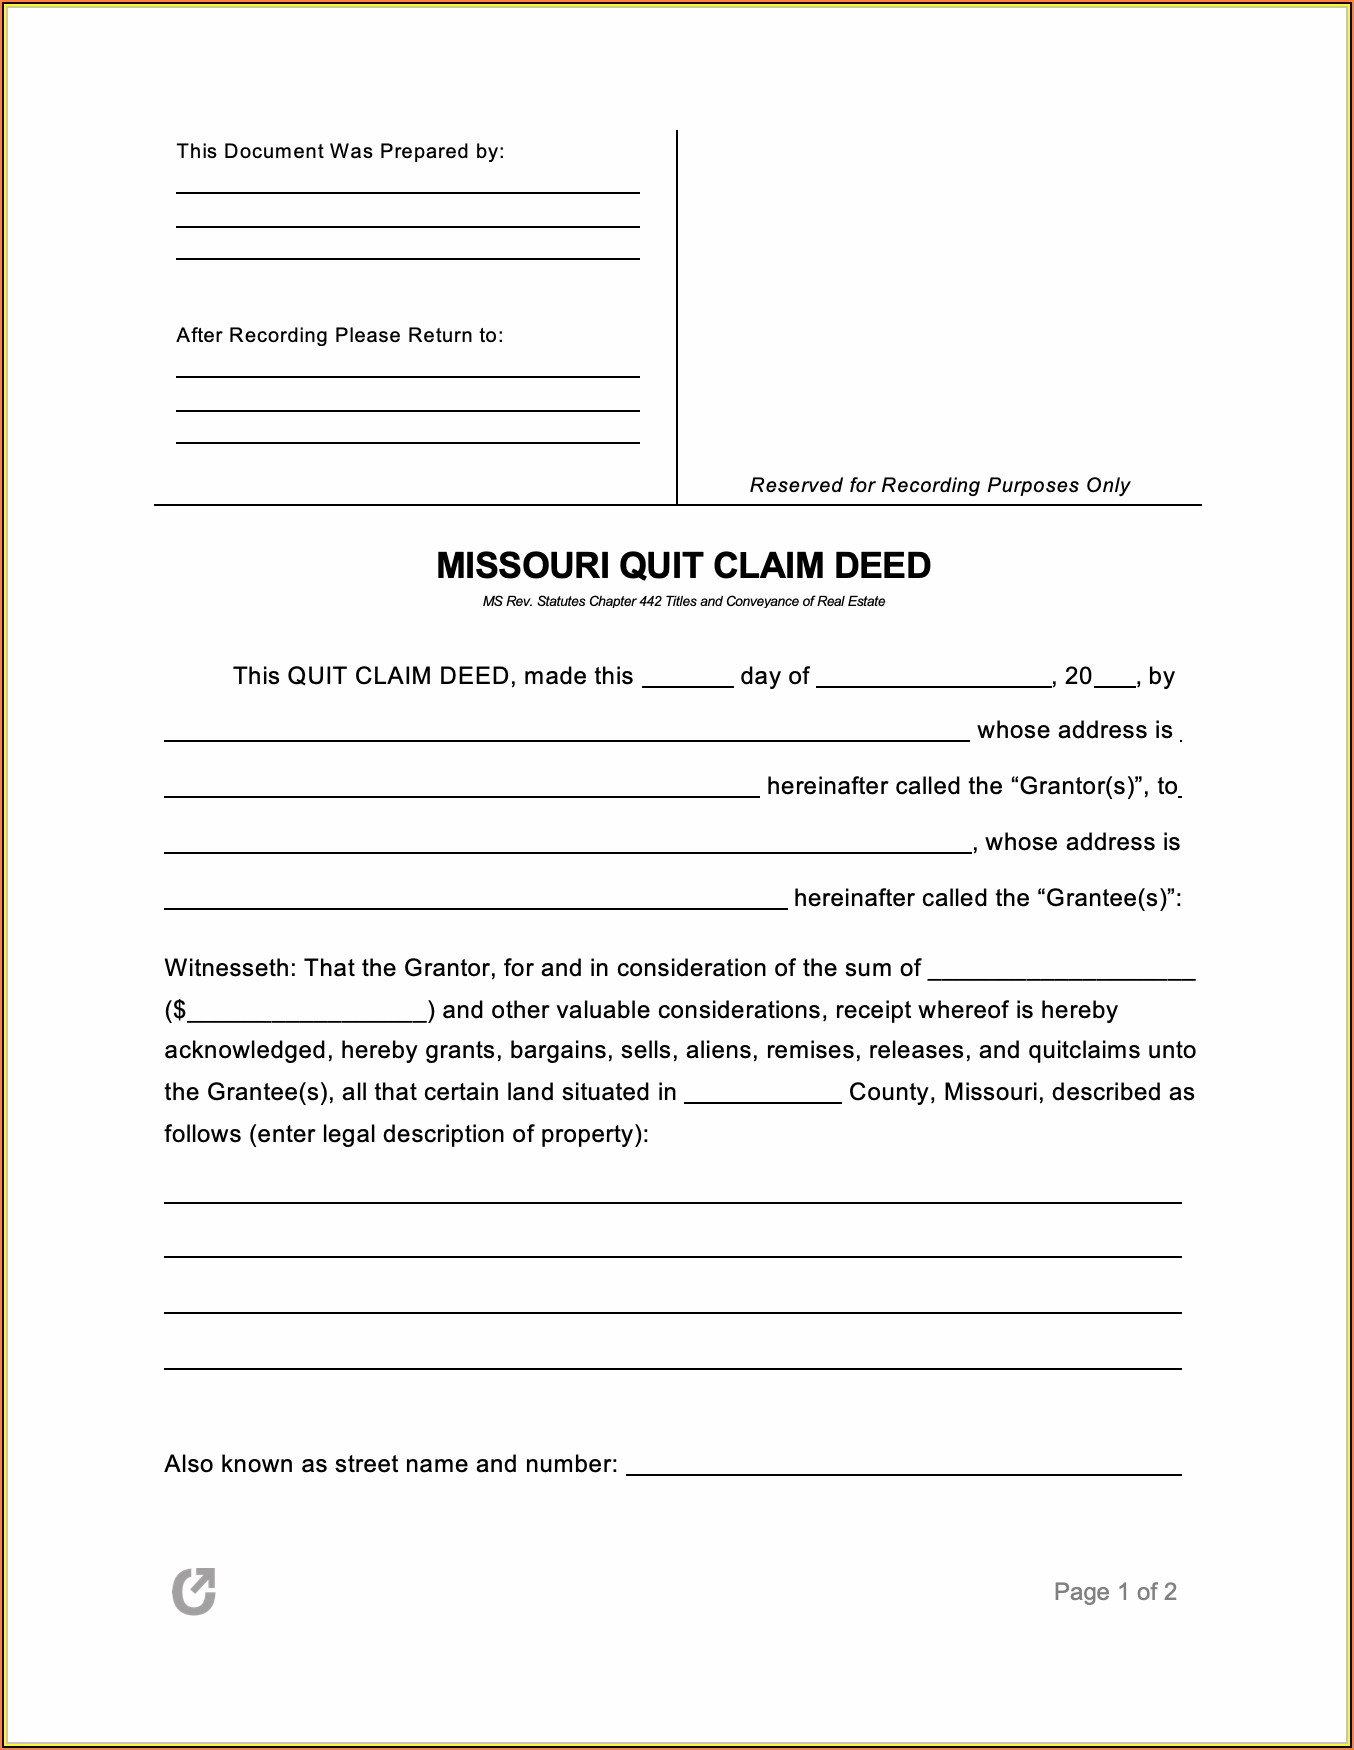 Missouri Quit Claim Deed Form Pdf